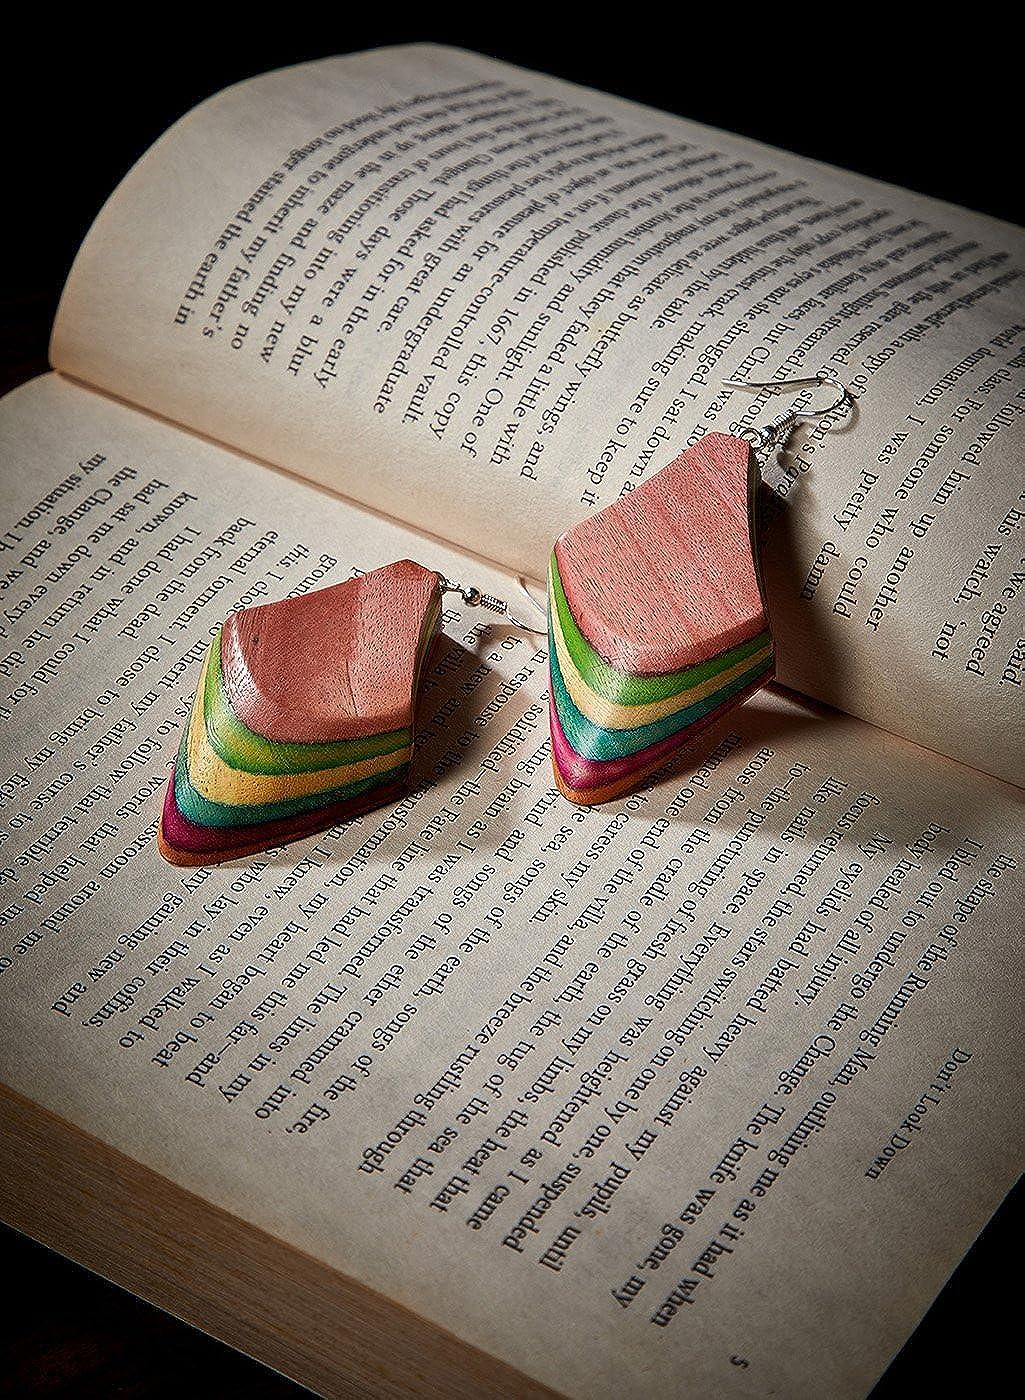 ZeroKaata Fashion Jewellery Drop Shaped Multicolored Wooden Handmade Jewellery Earrings For Girls and Women